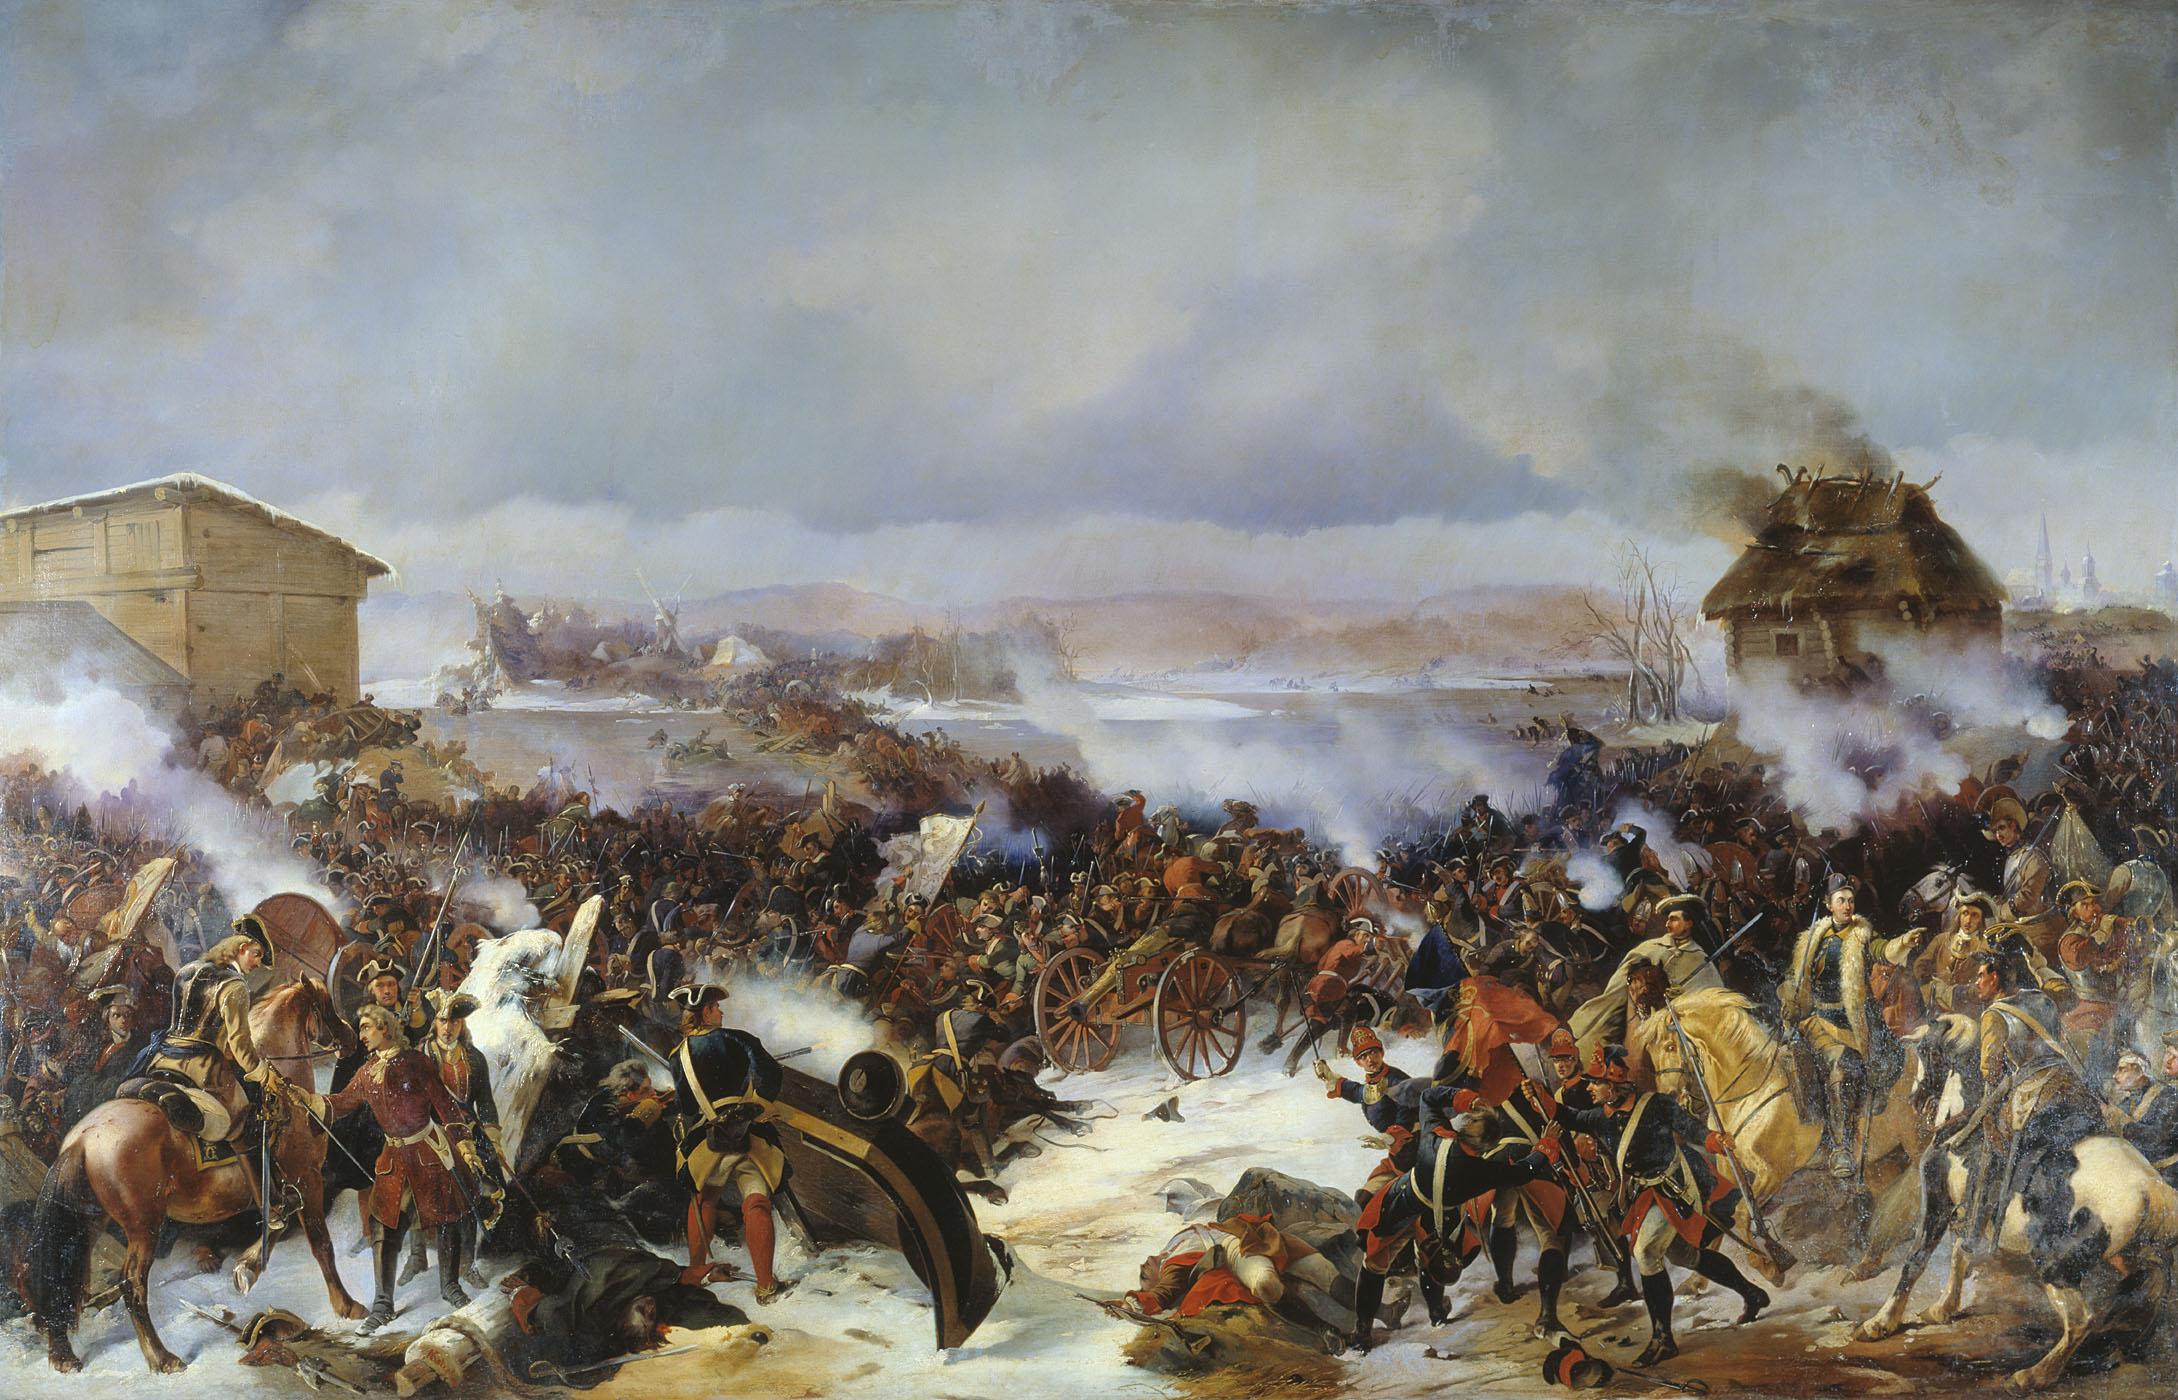 https://i2.wp.com/upload.wikimedia.org/wikipedia/commons/3/39/Battle_of_Narva_1700.JPG